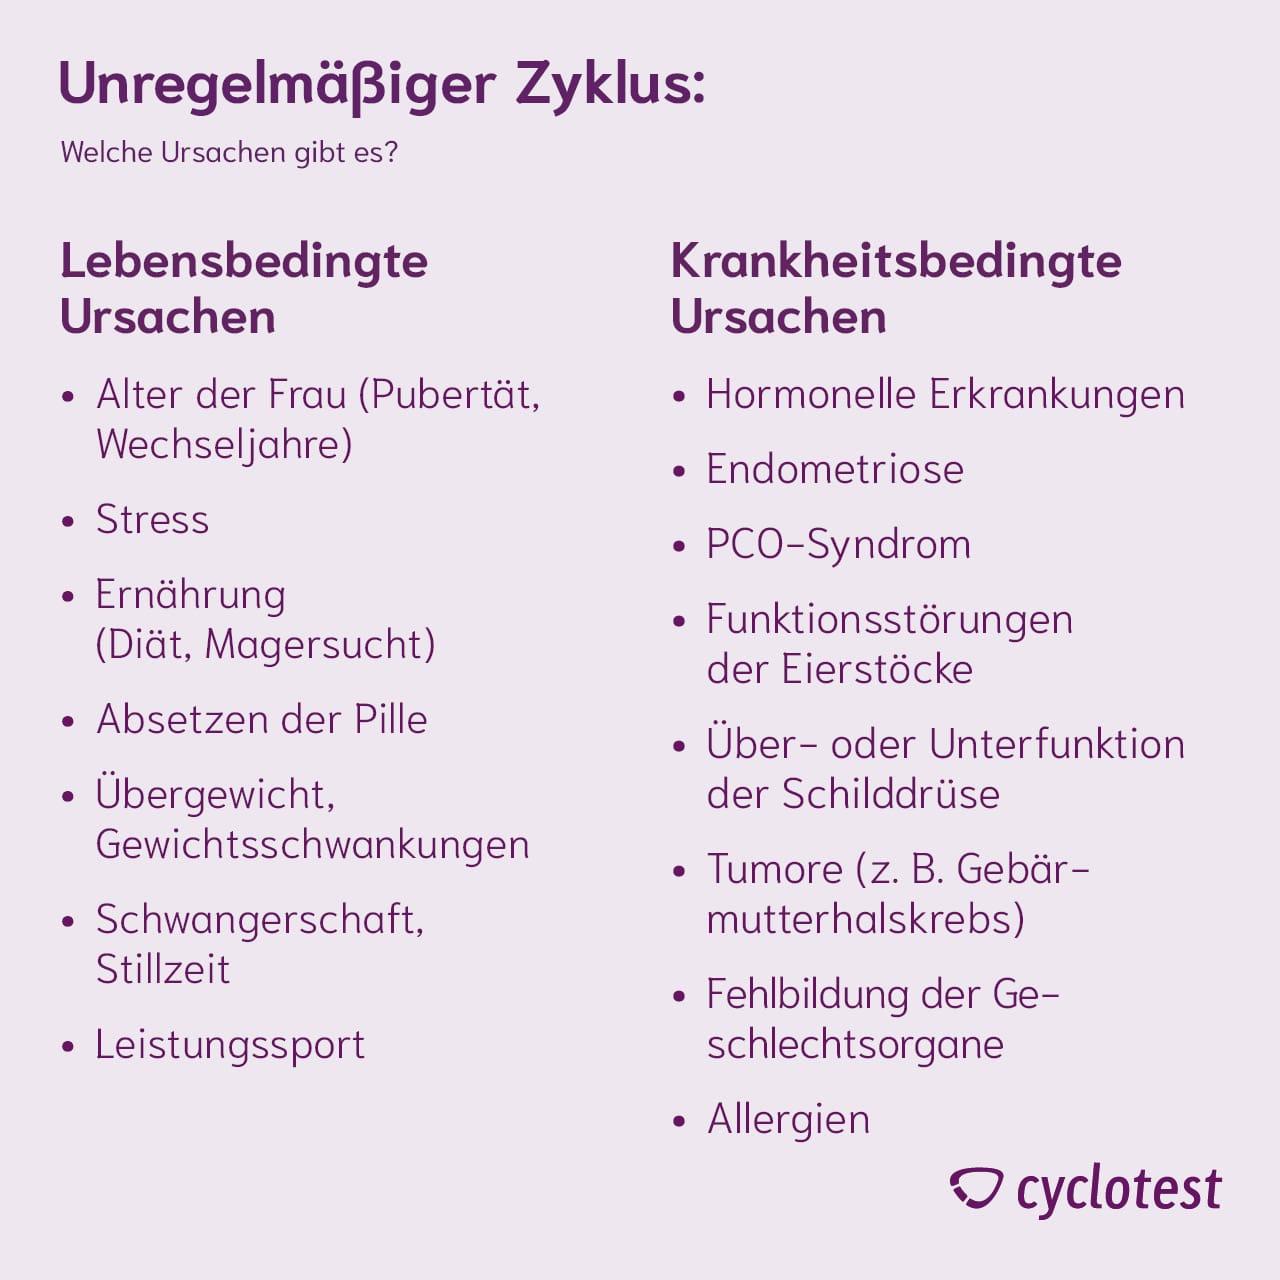 ovulationstest bei unregelmäßigem zyklus